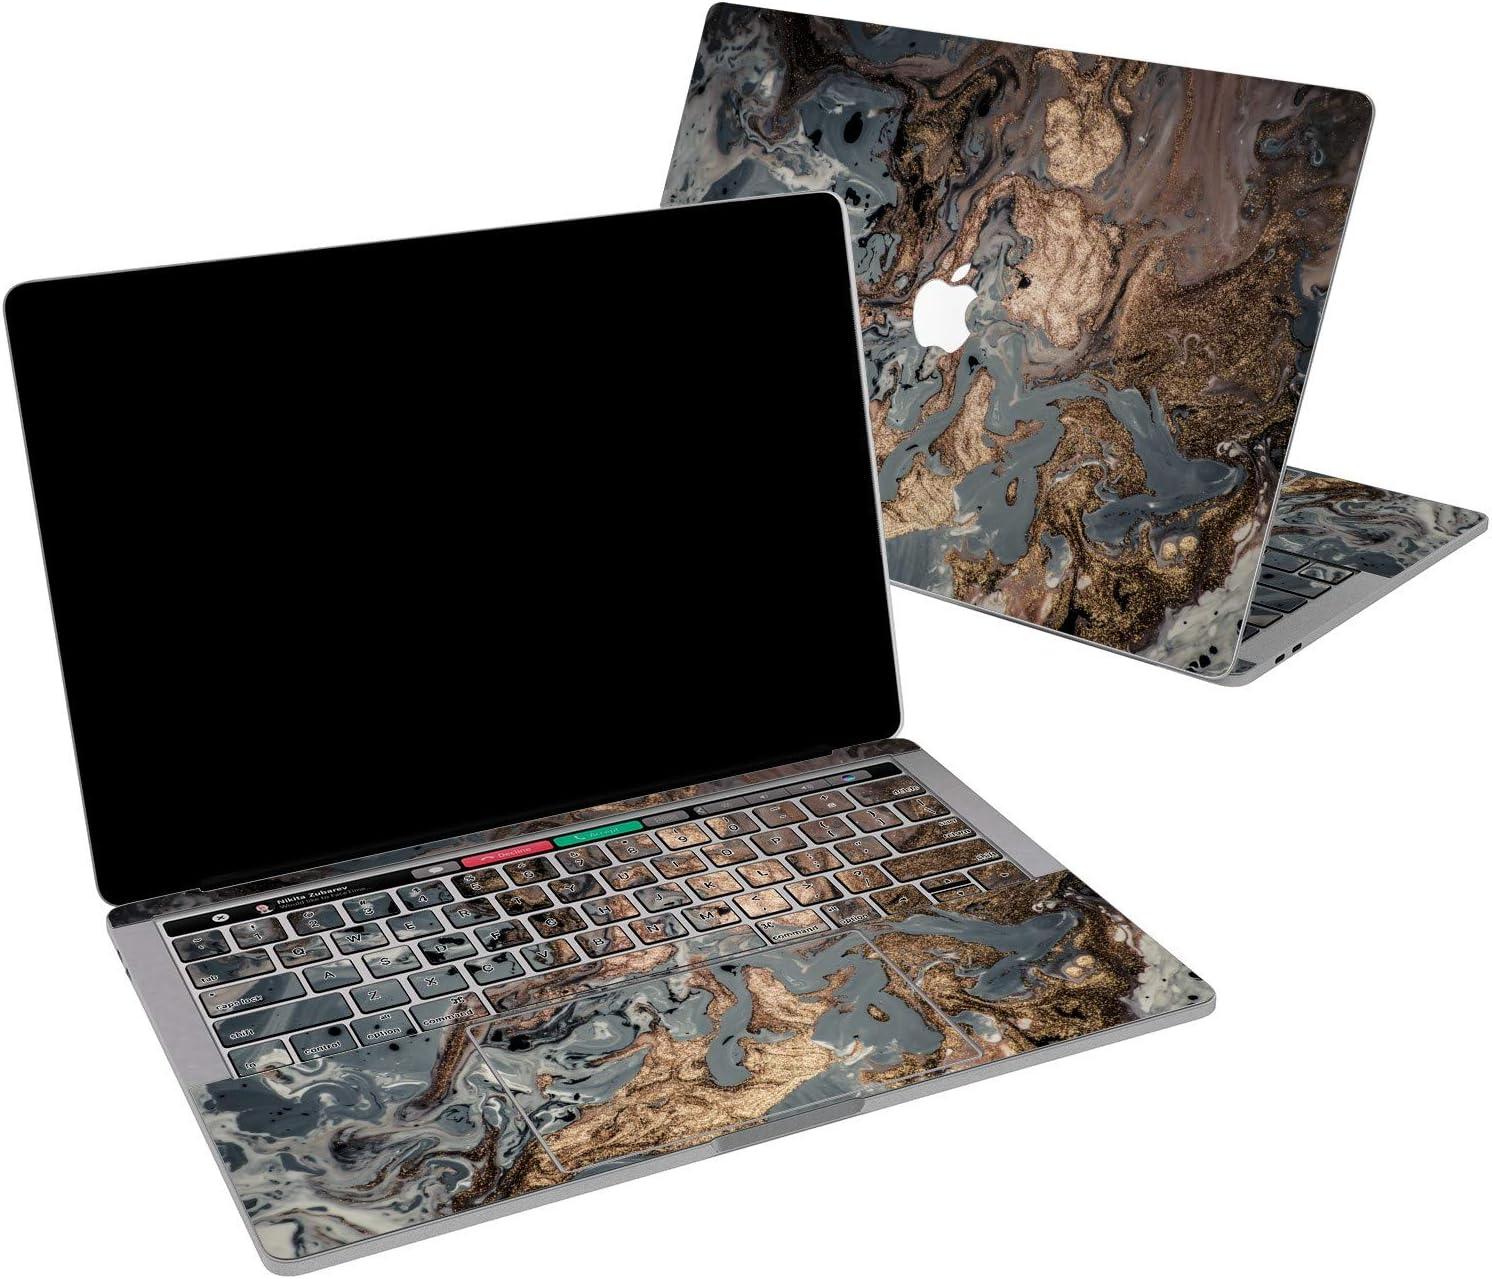 Lex Altern Vinyl Skin for MacBook Air 13 inch Mac Pro 16 15 Retina 12 11 2020 2019 2018 2017 Bronze Paint Pattern Black Golden Minimal Texture Wrap Laptop Cover Protective Decal Sticker Touch Bar